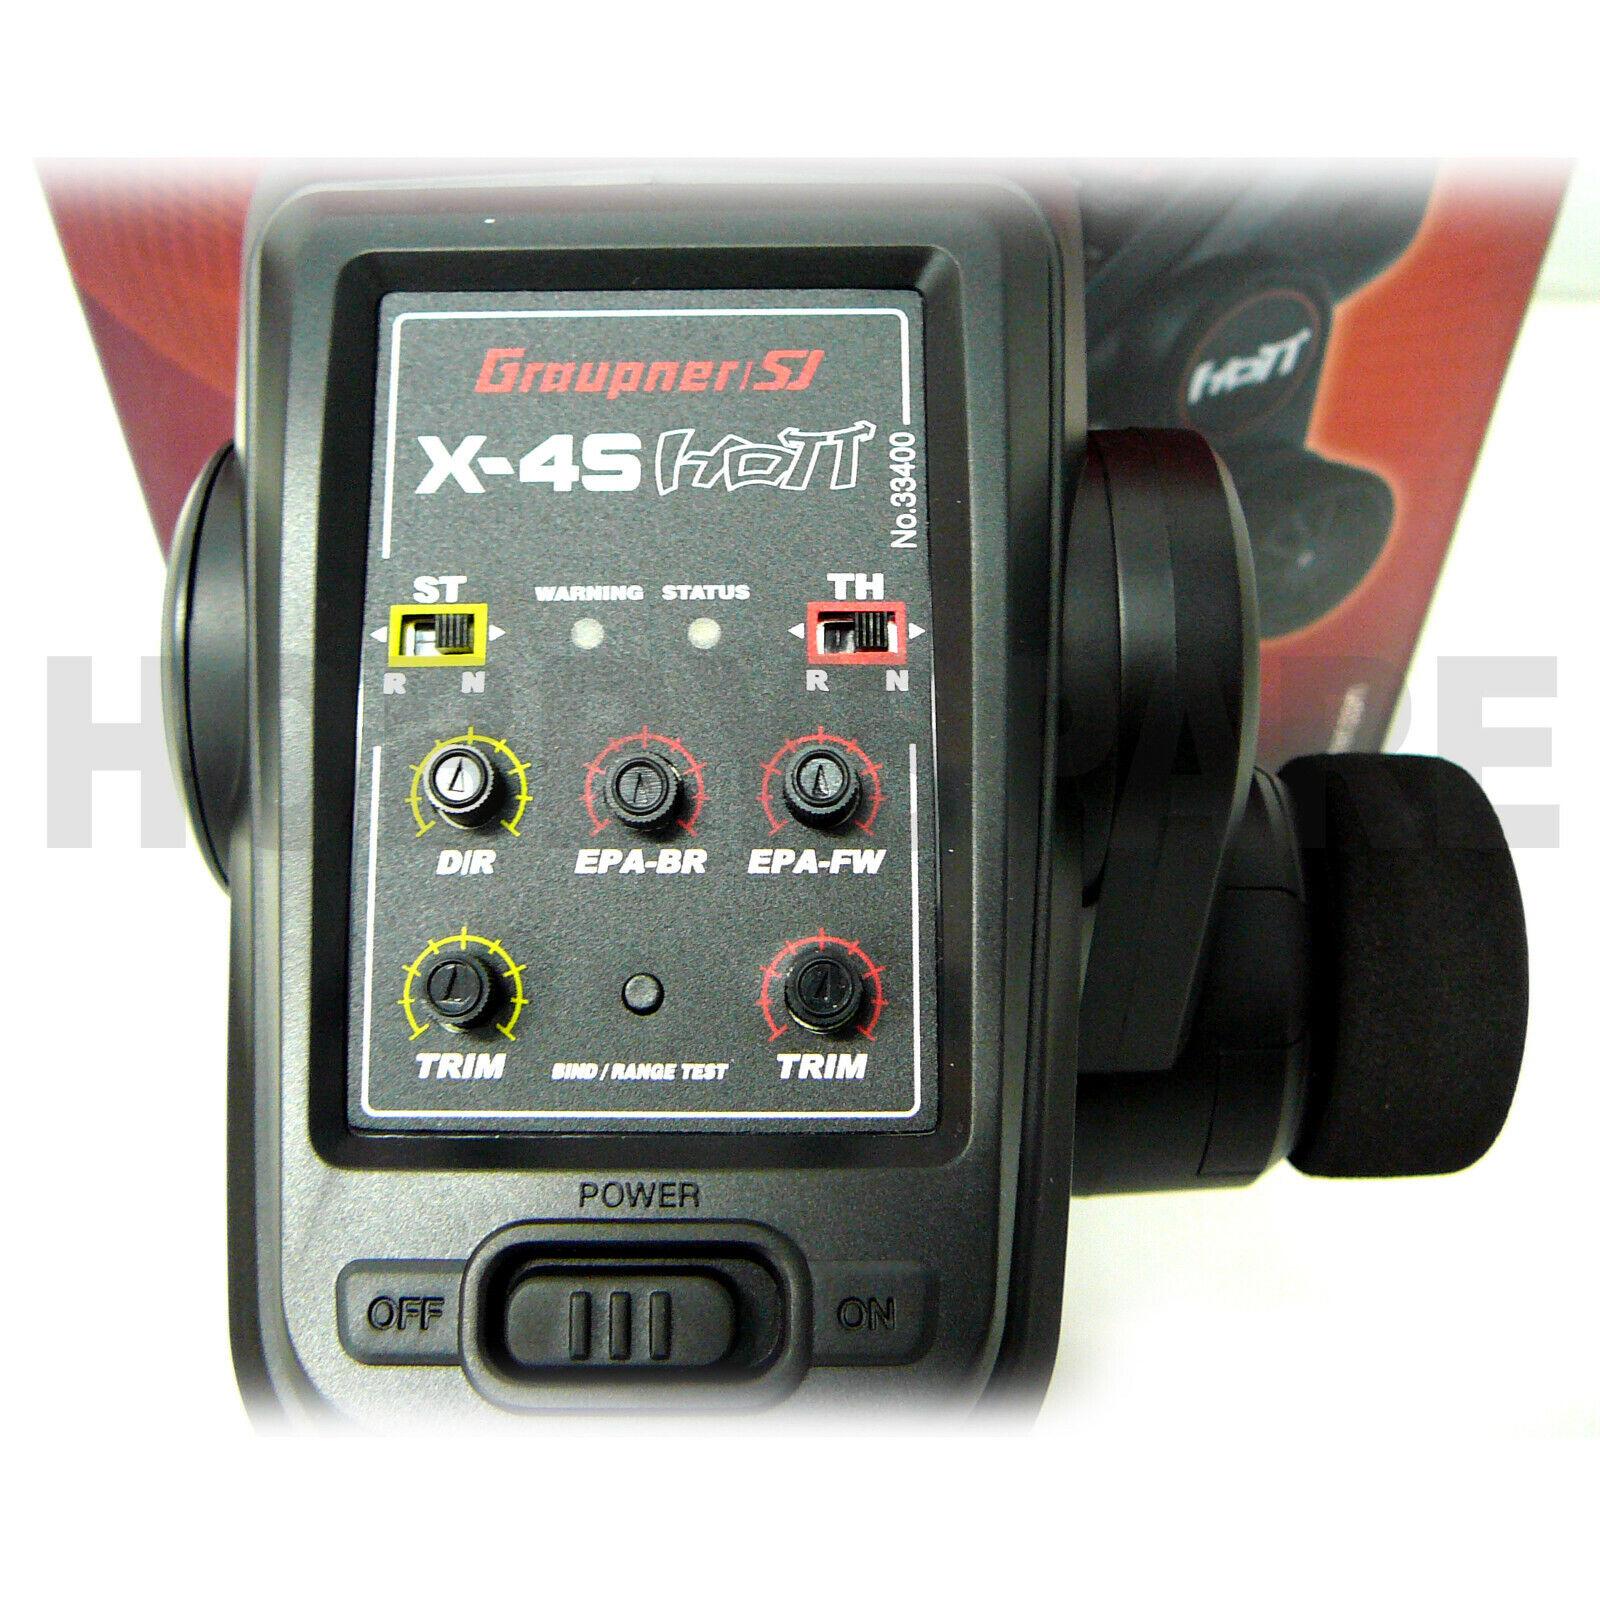 Nuovo grigioPNER X-4S 2.4Ghz RC RC RC auto RADIO w RECEIVER LEFT RIGHT He calienteT 33400 c5b518